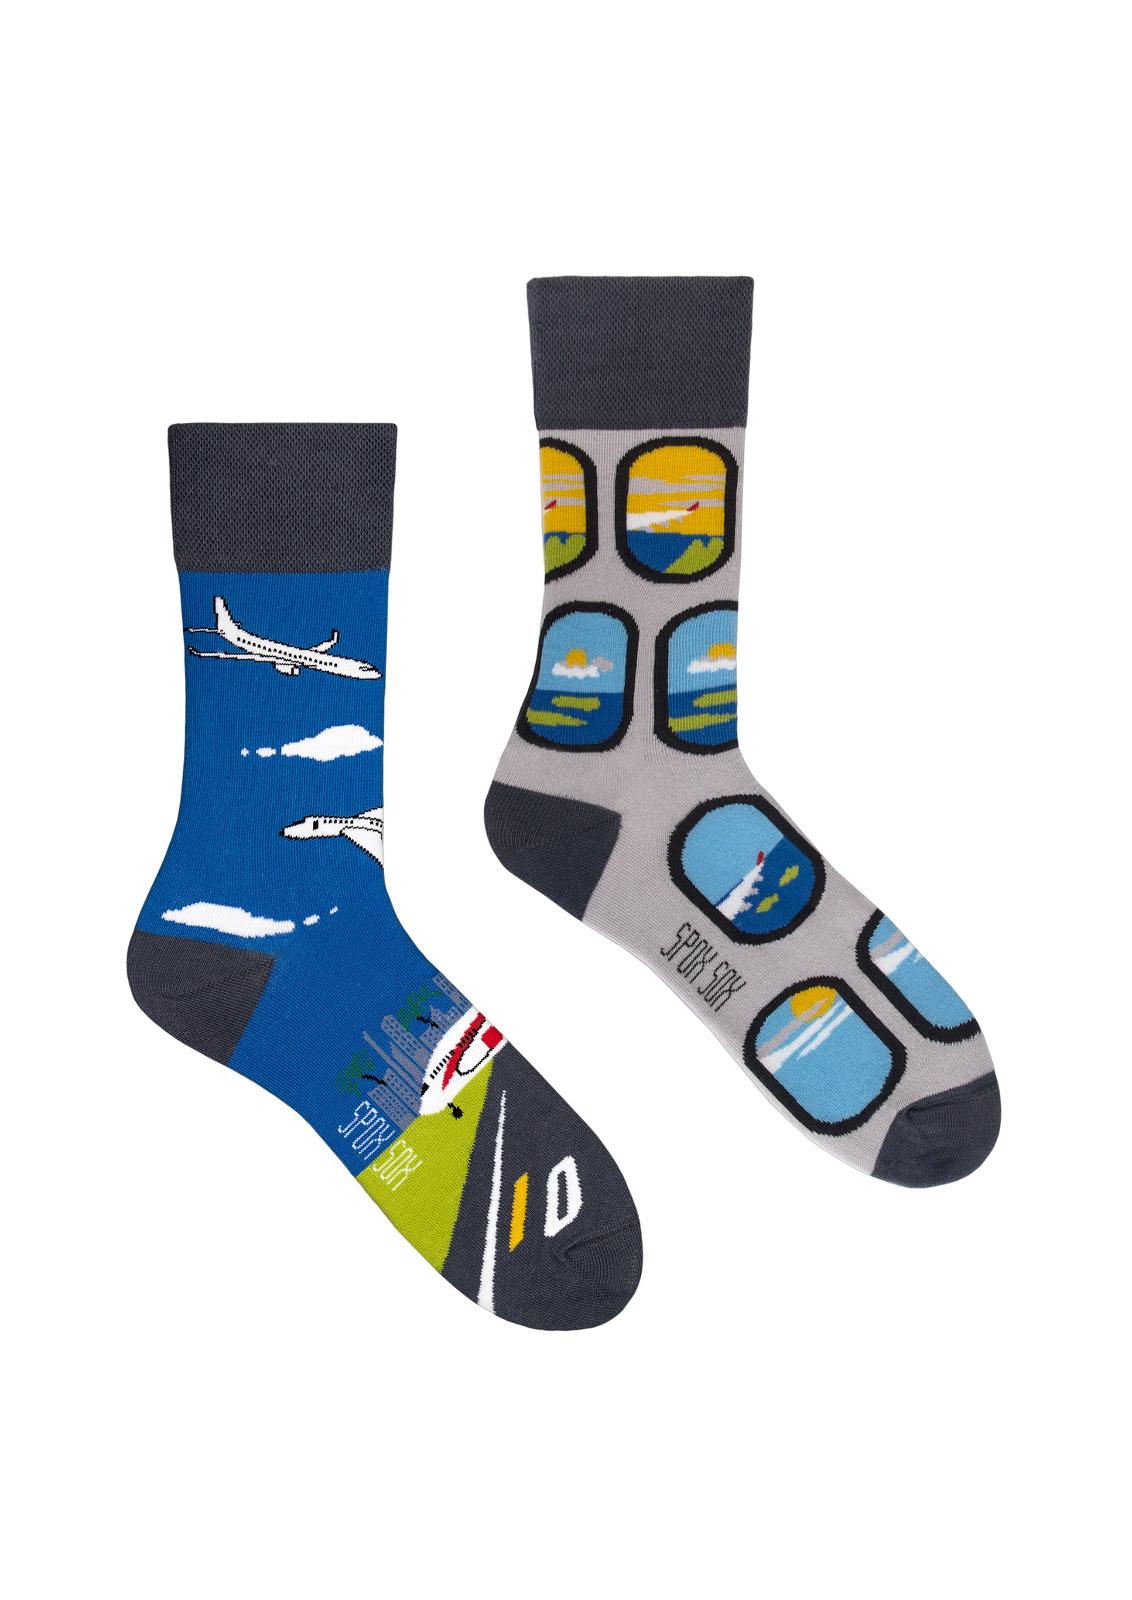 Ponožky Spox Sox - Letadla